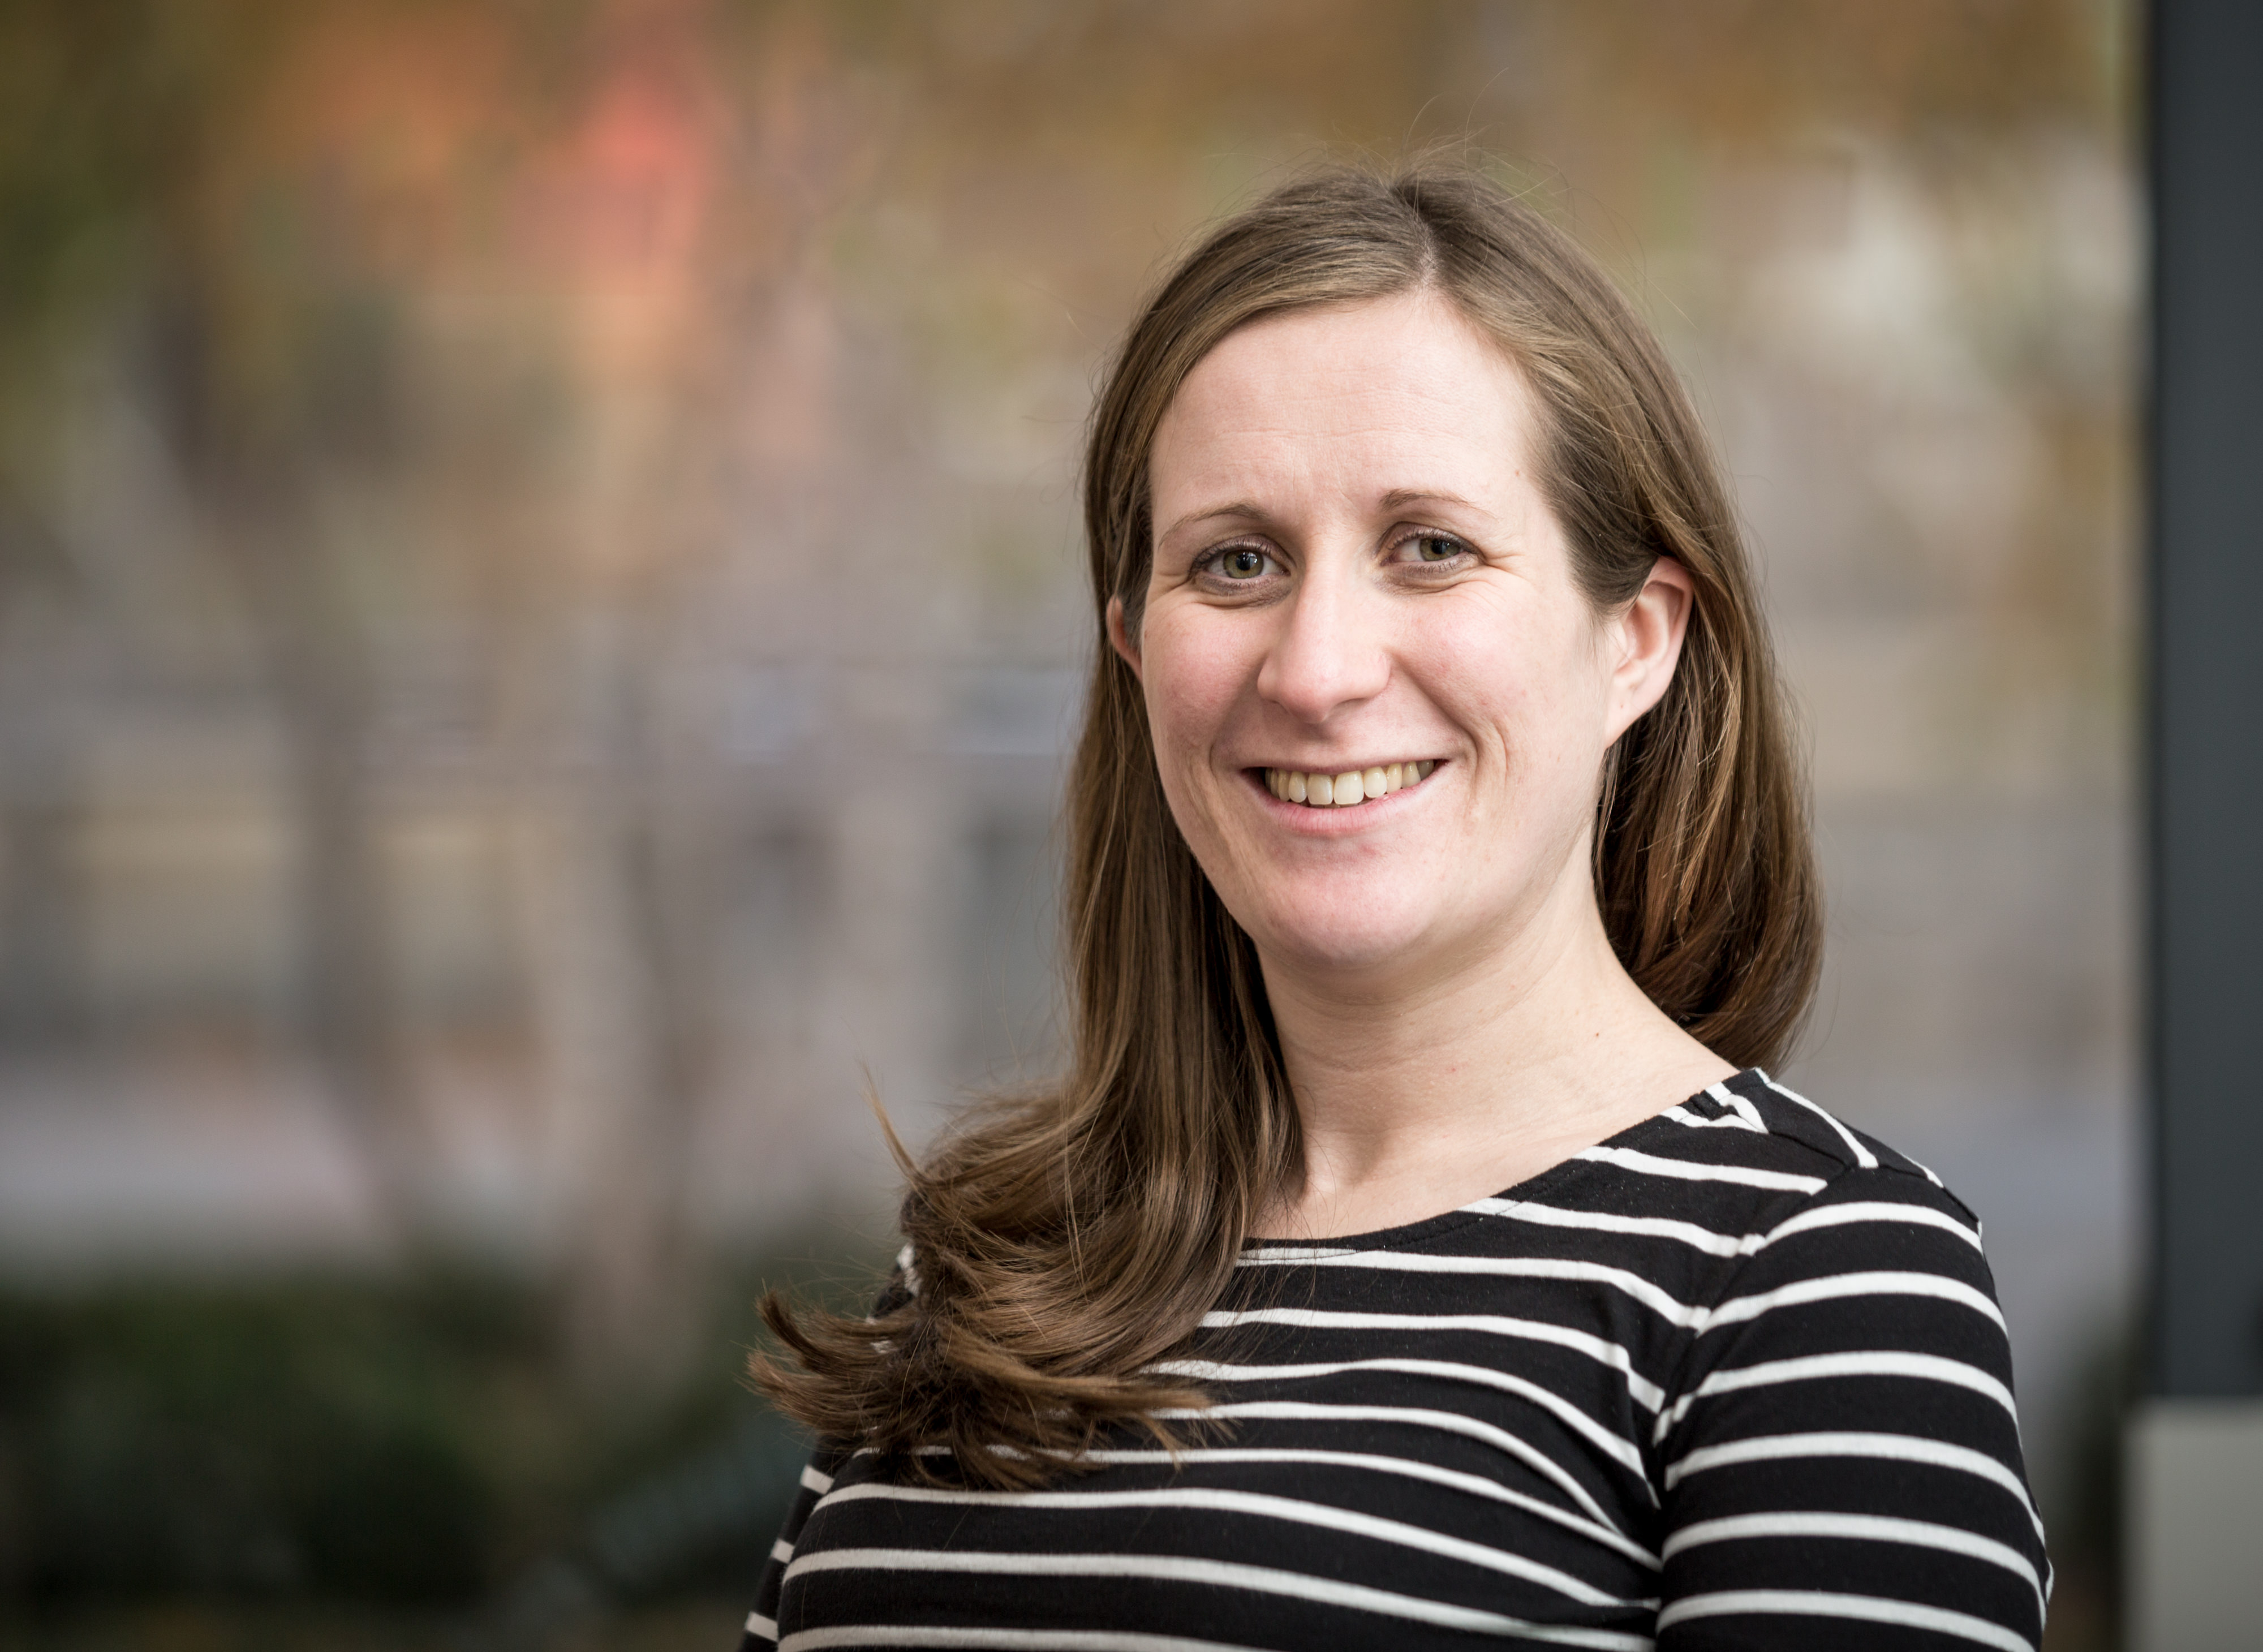 Julie Coackley Childcare Director